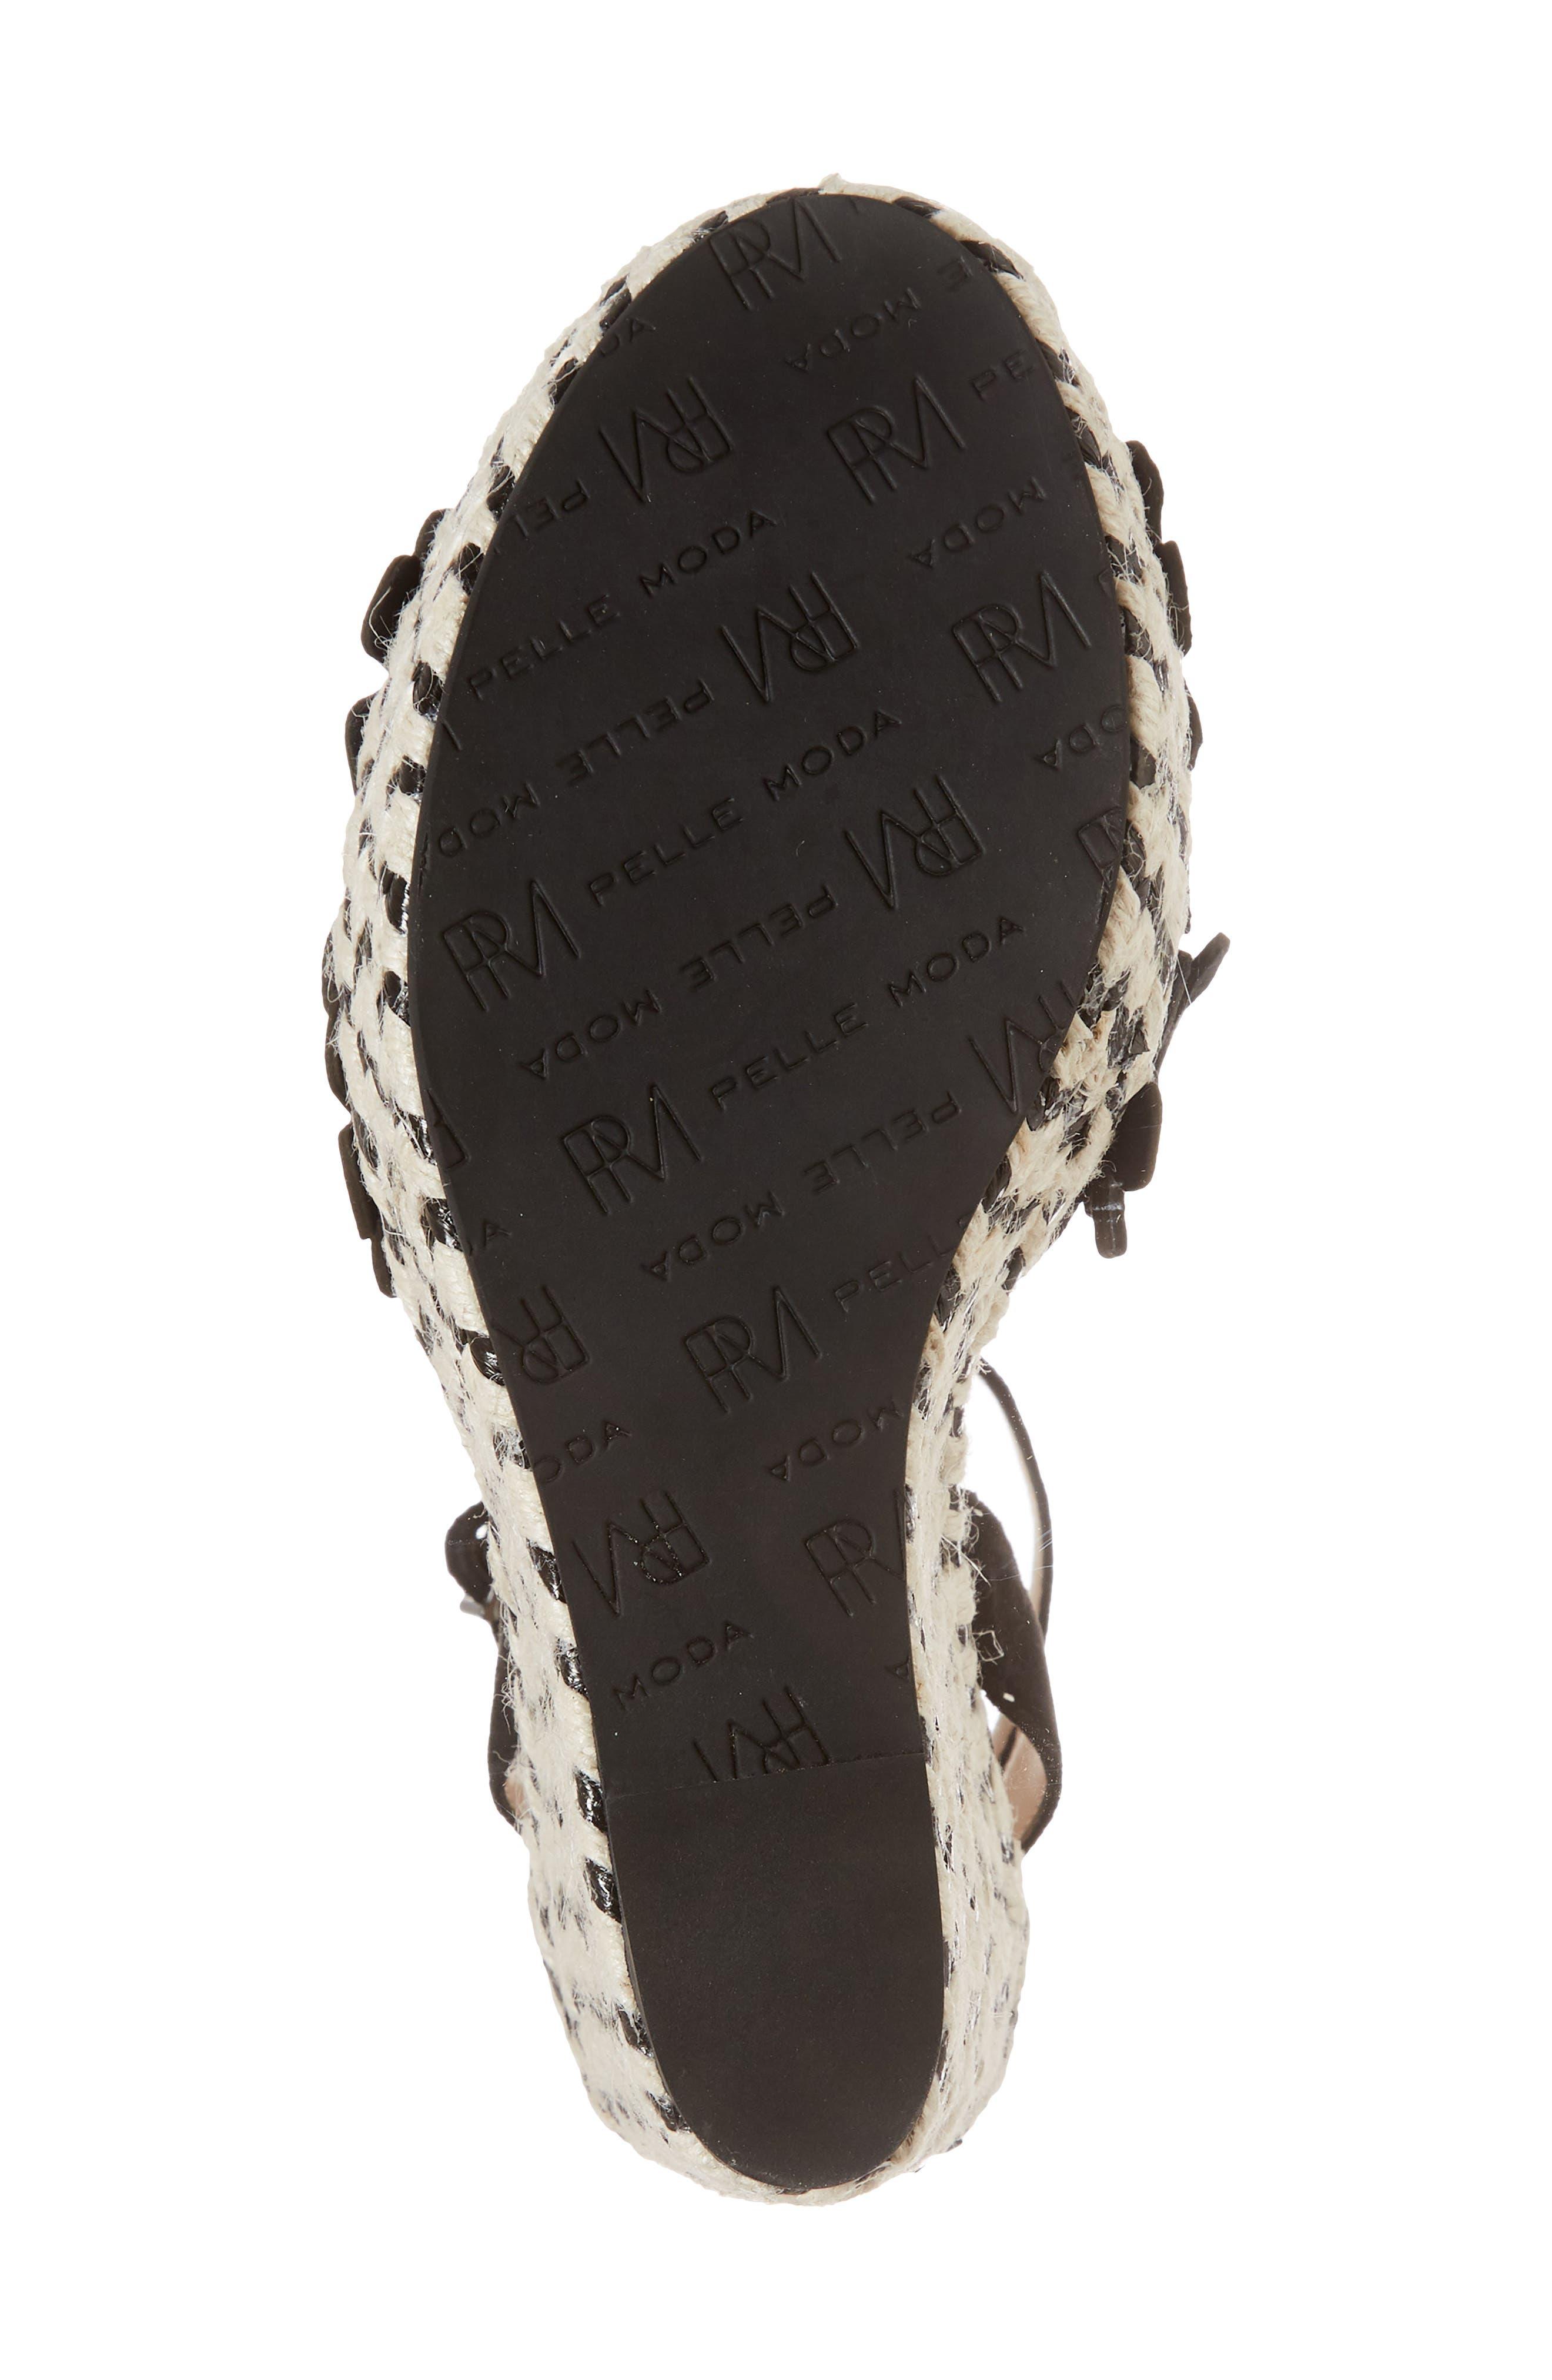 Waylin Espadrille Wedge Sandal,                             Alternate thumbnail 6, color,                             Black Suede